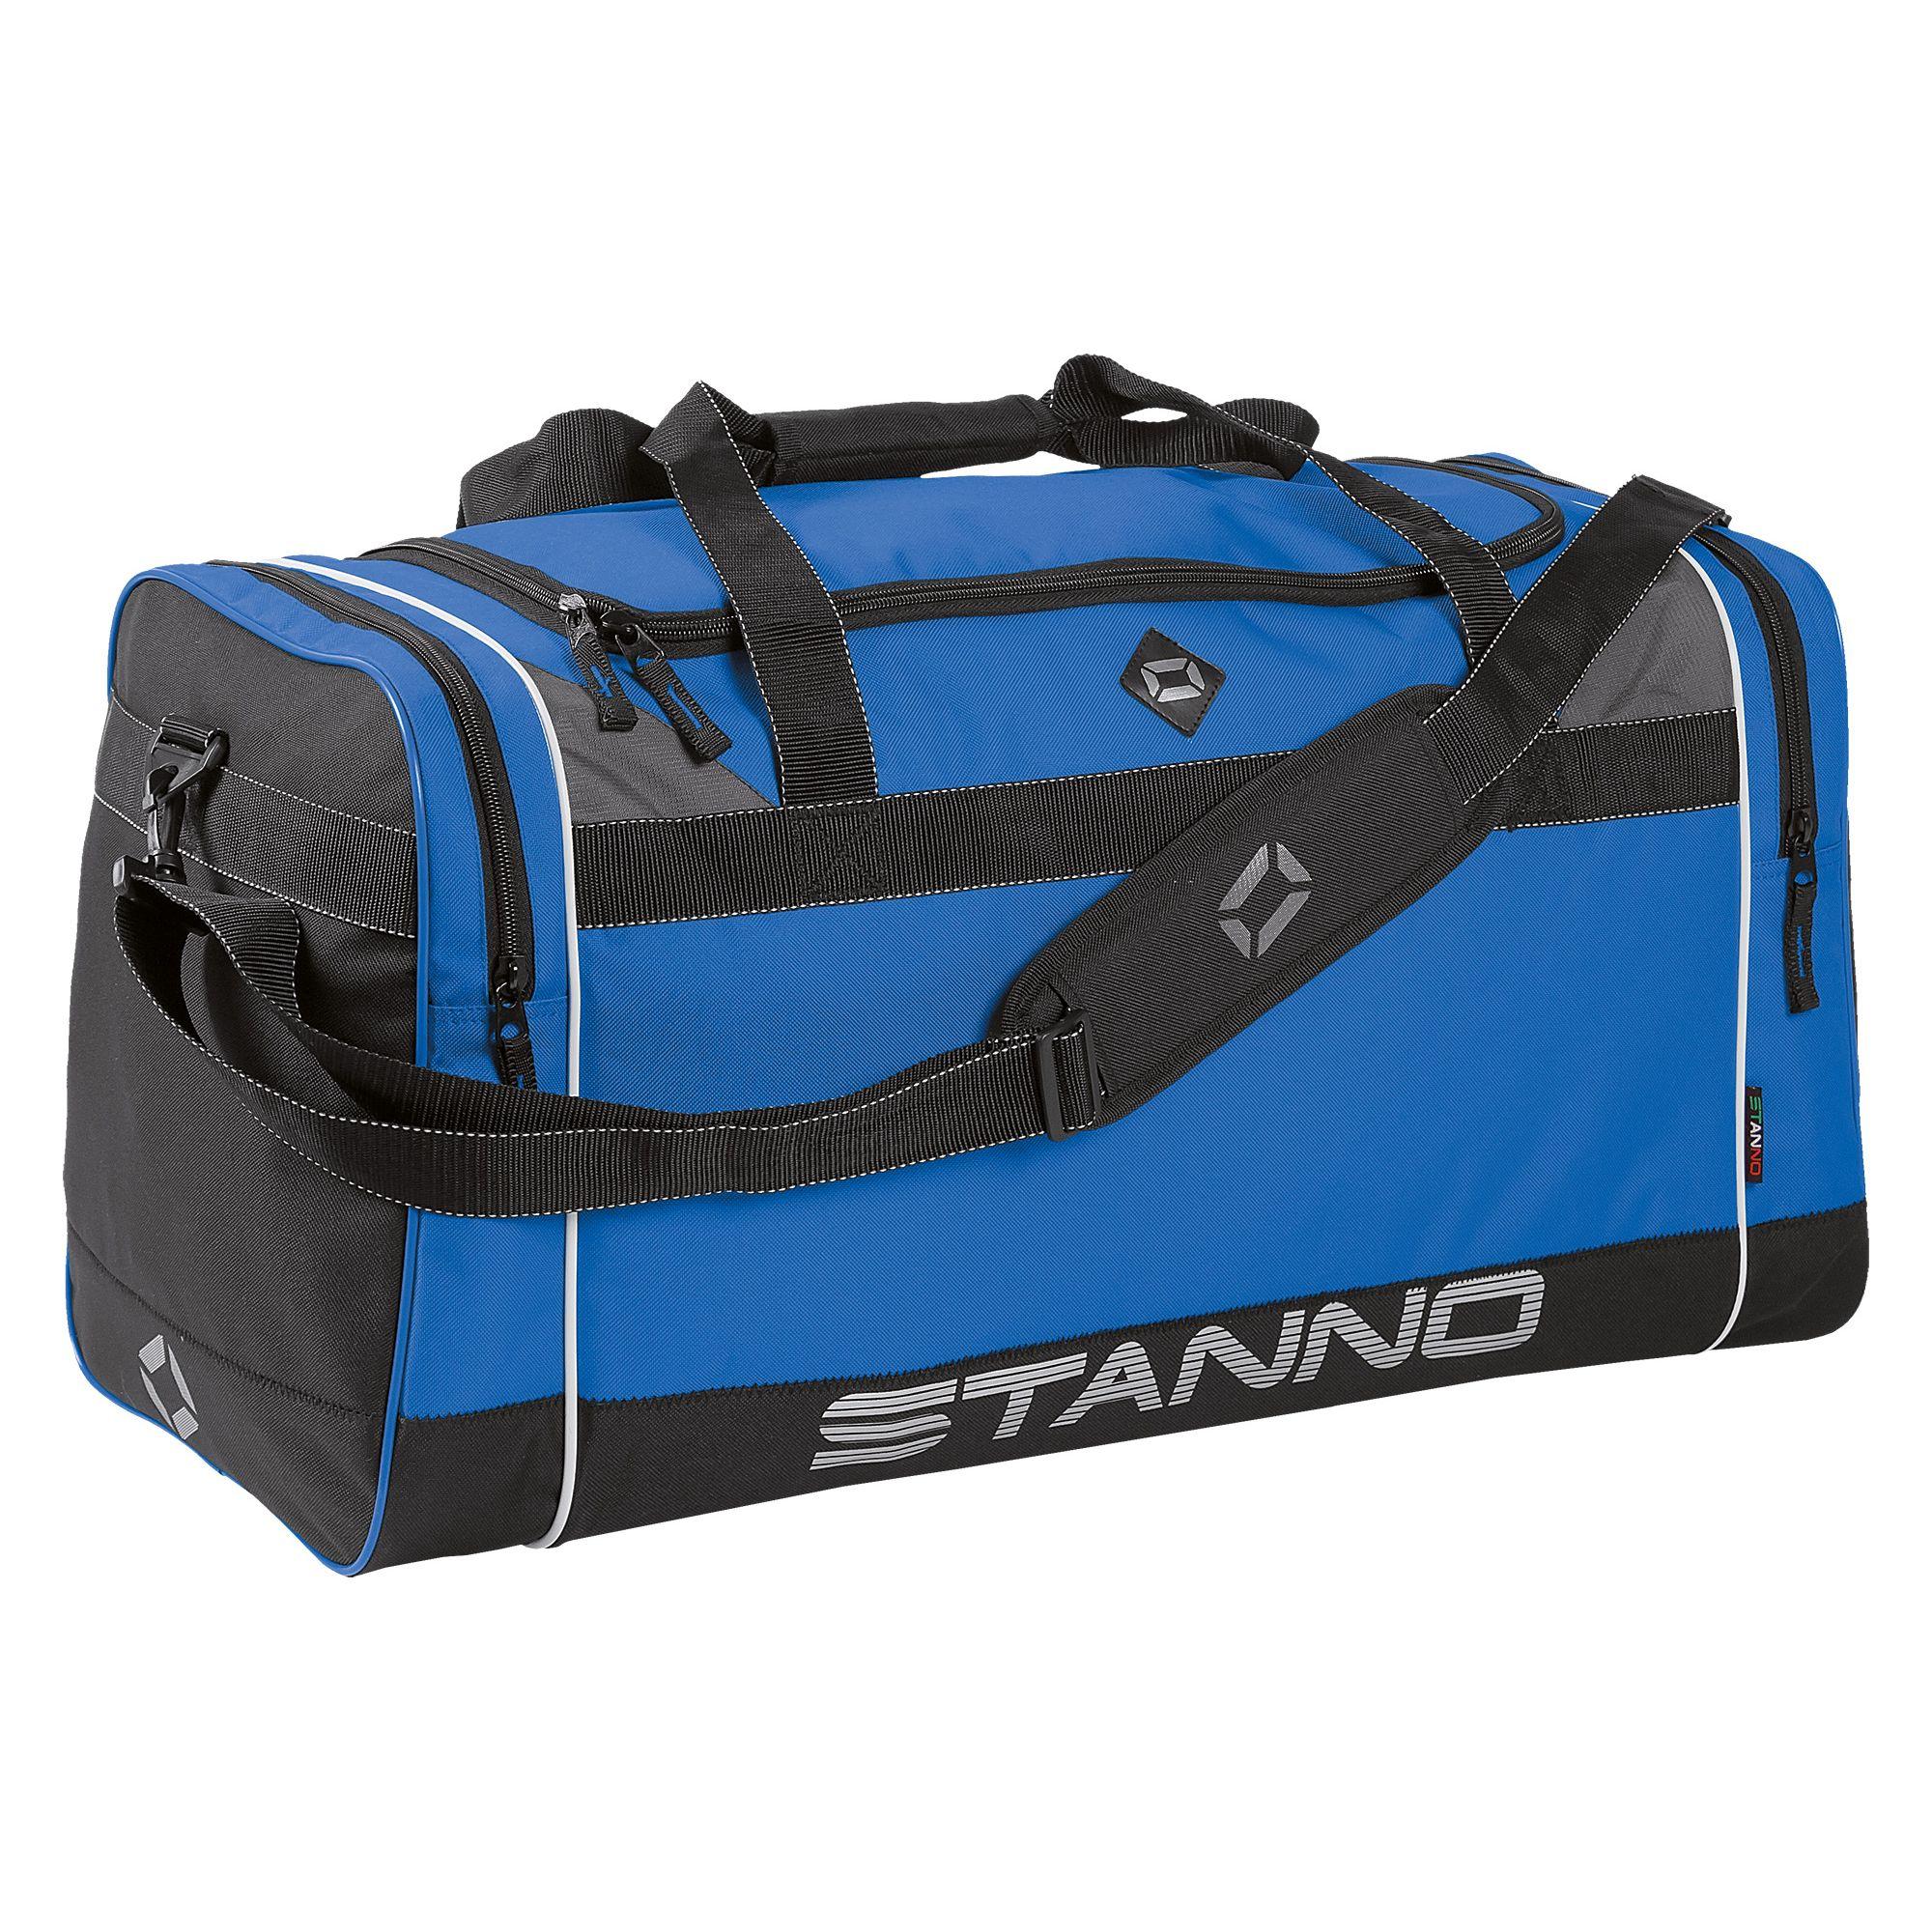 Stanno Lerida Excellence Sports Bag Blue 6041b1dd61502